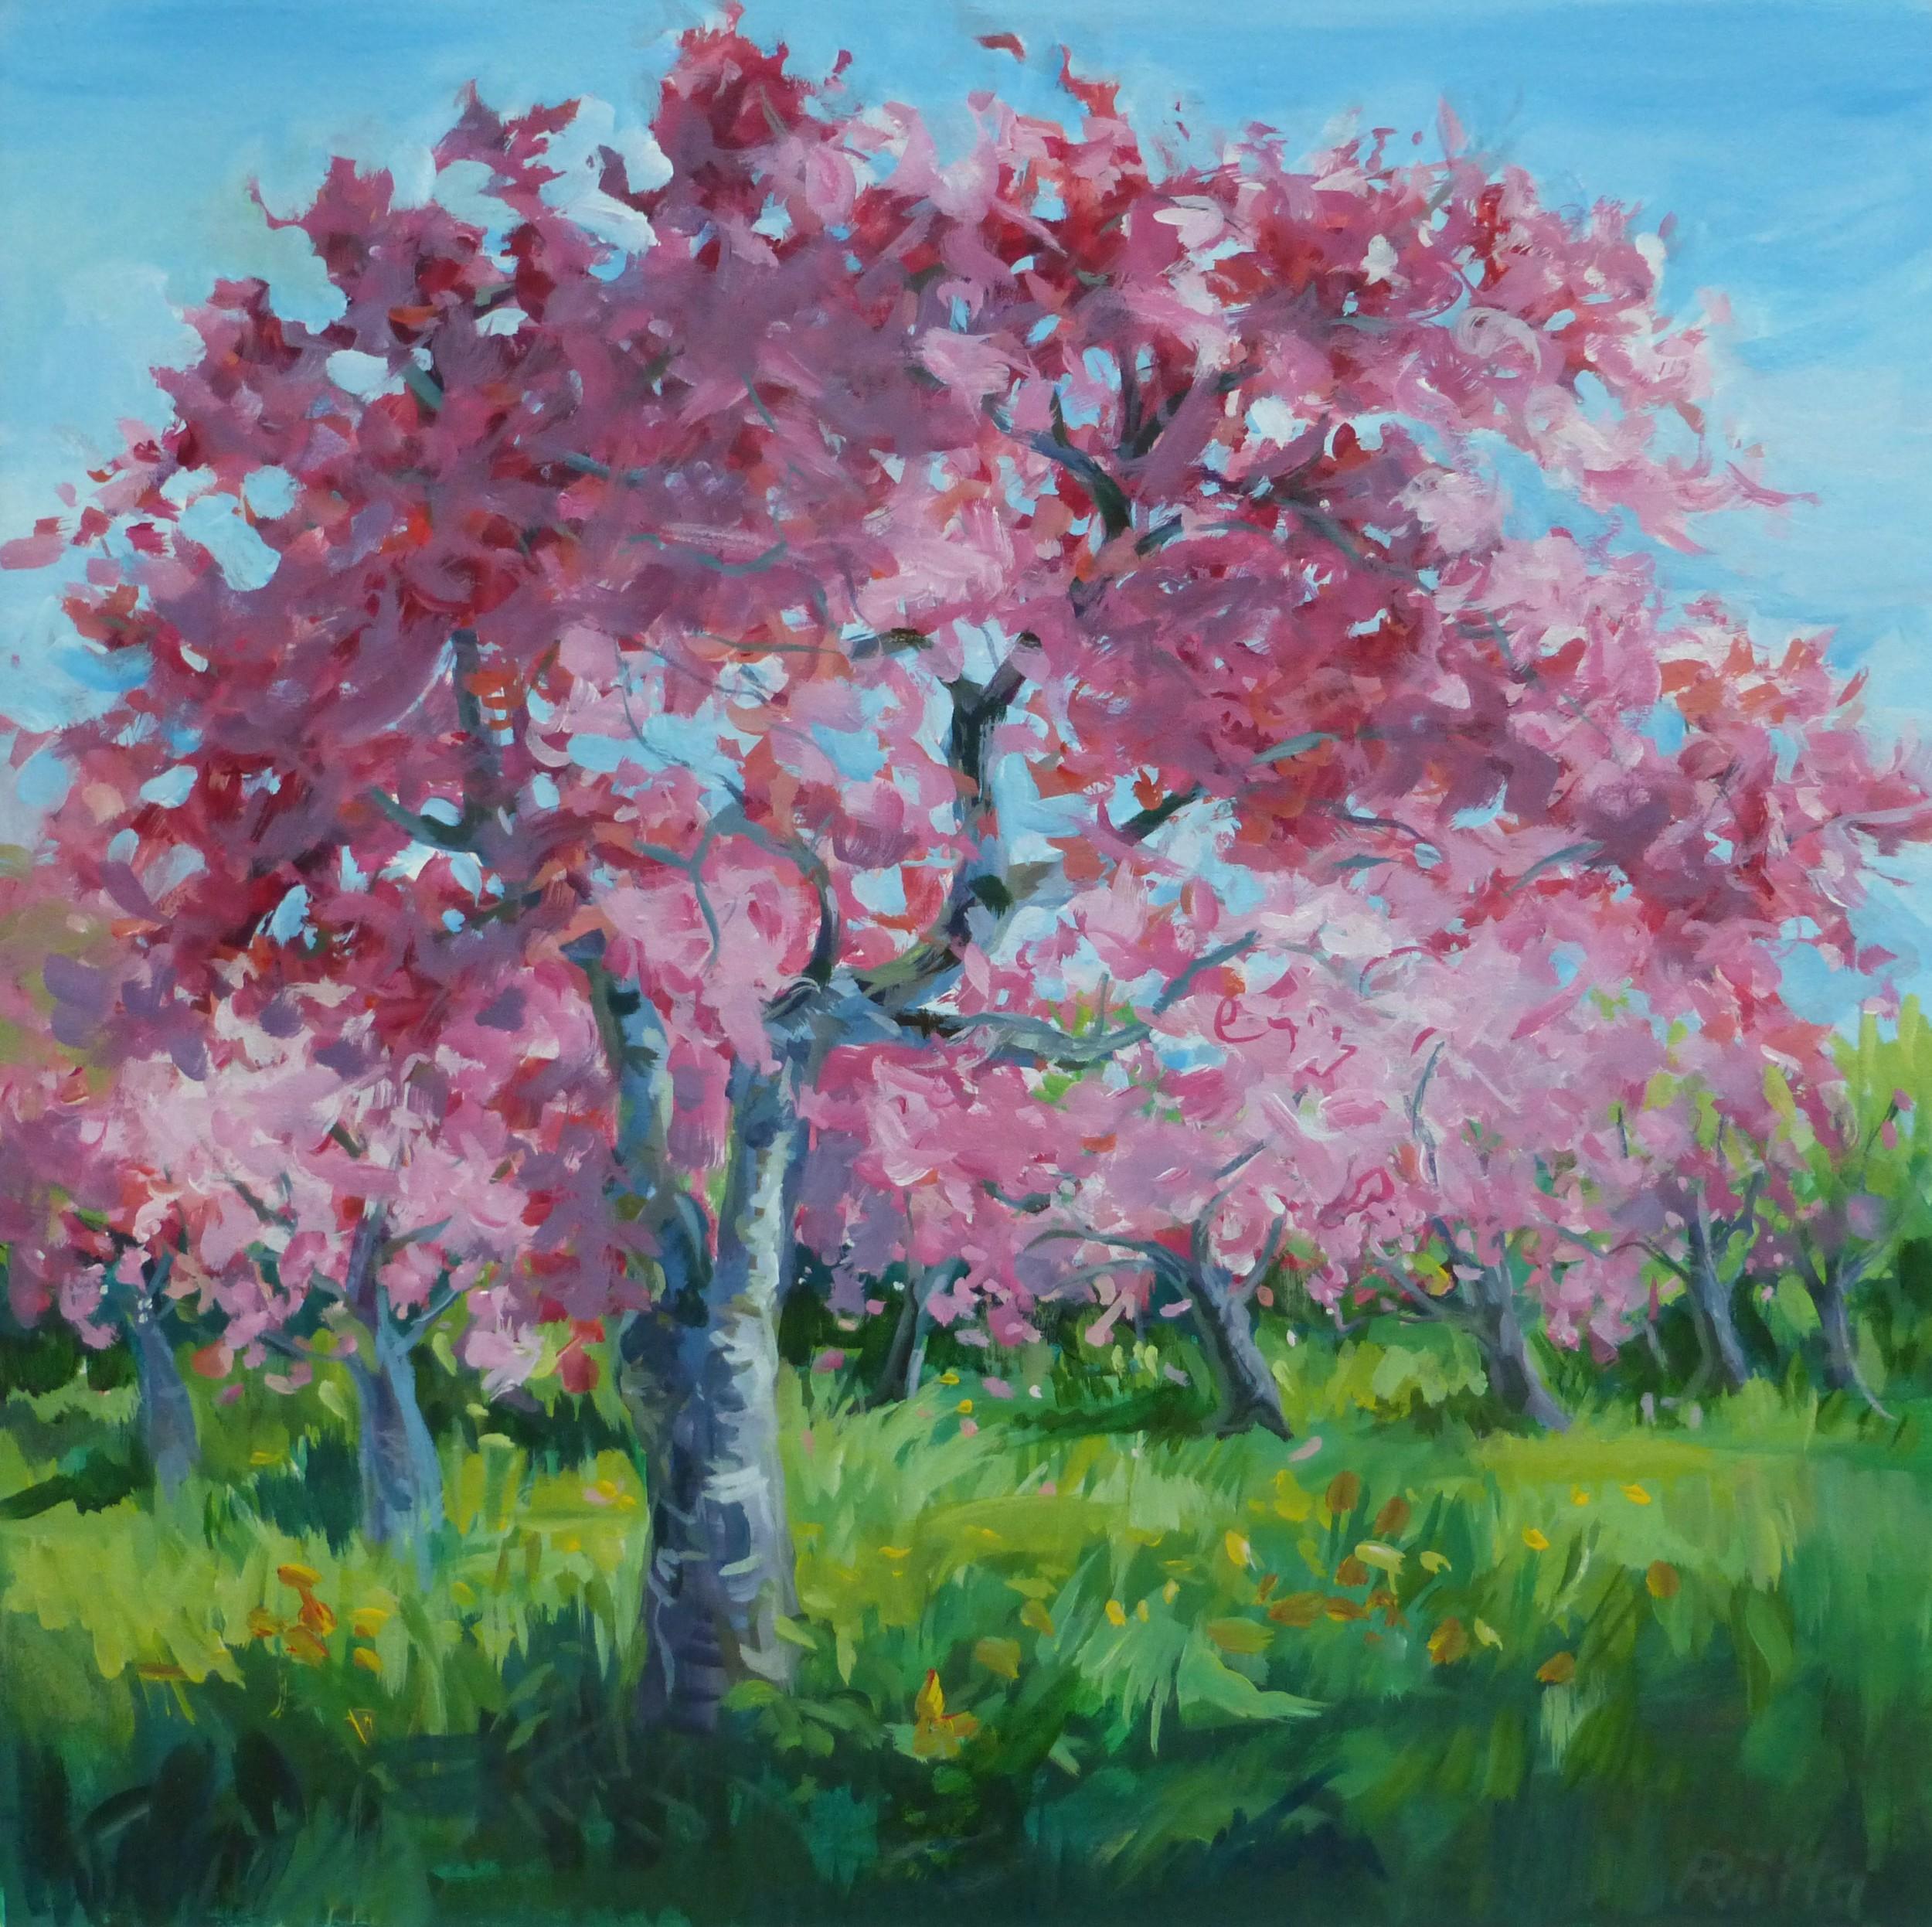 The Joy of Spring 24 x 24 acrylic